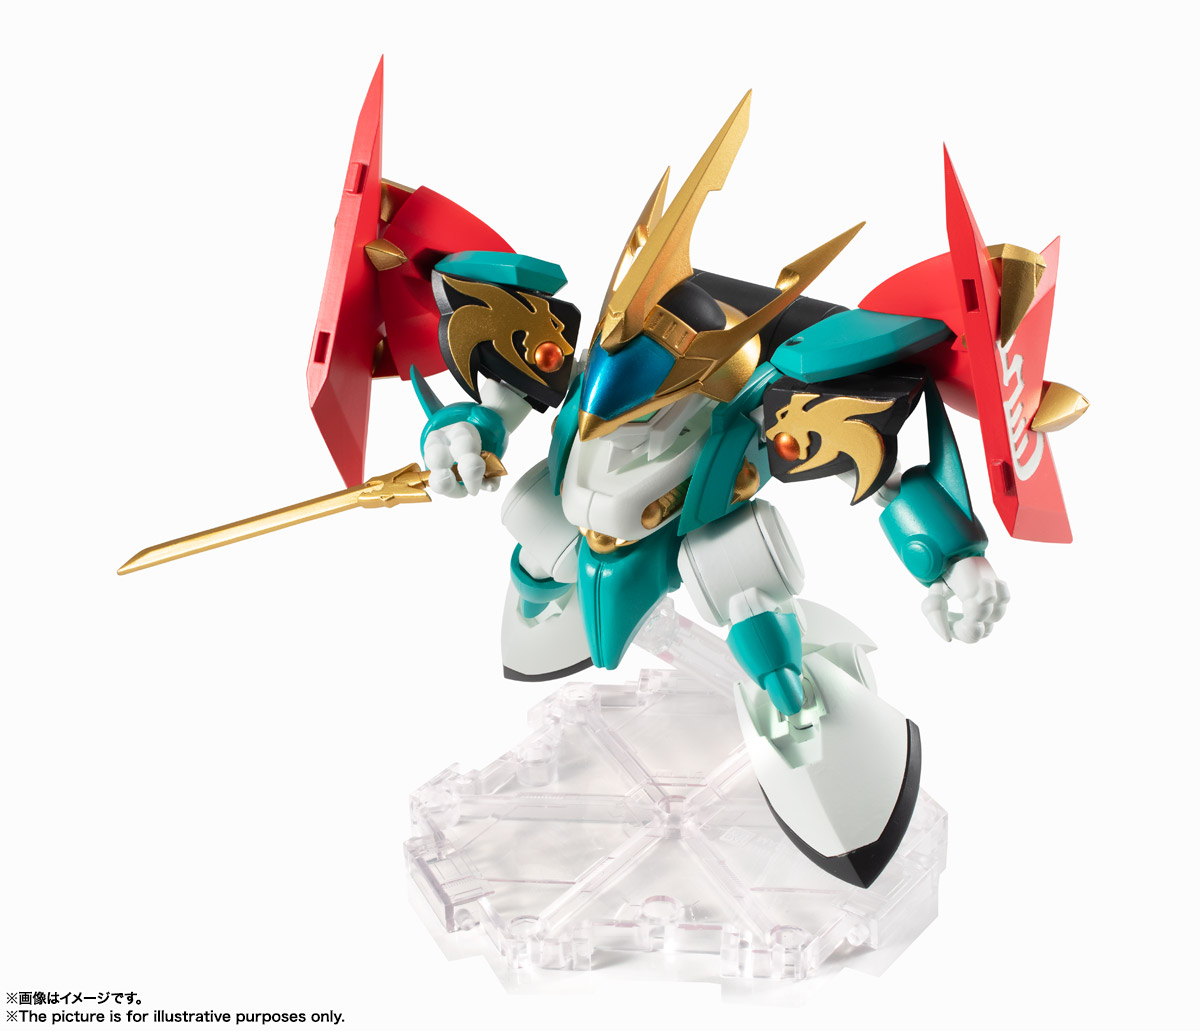 NXEDGE STYLE[MASHIN UNIT]『幻龍丸』魔神英雄伝ワタル 可動フィギュア-004